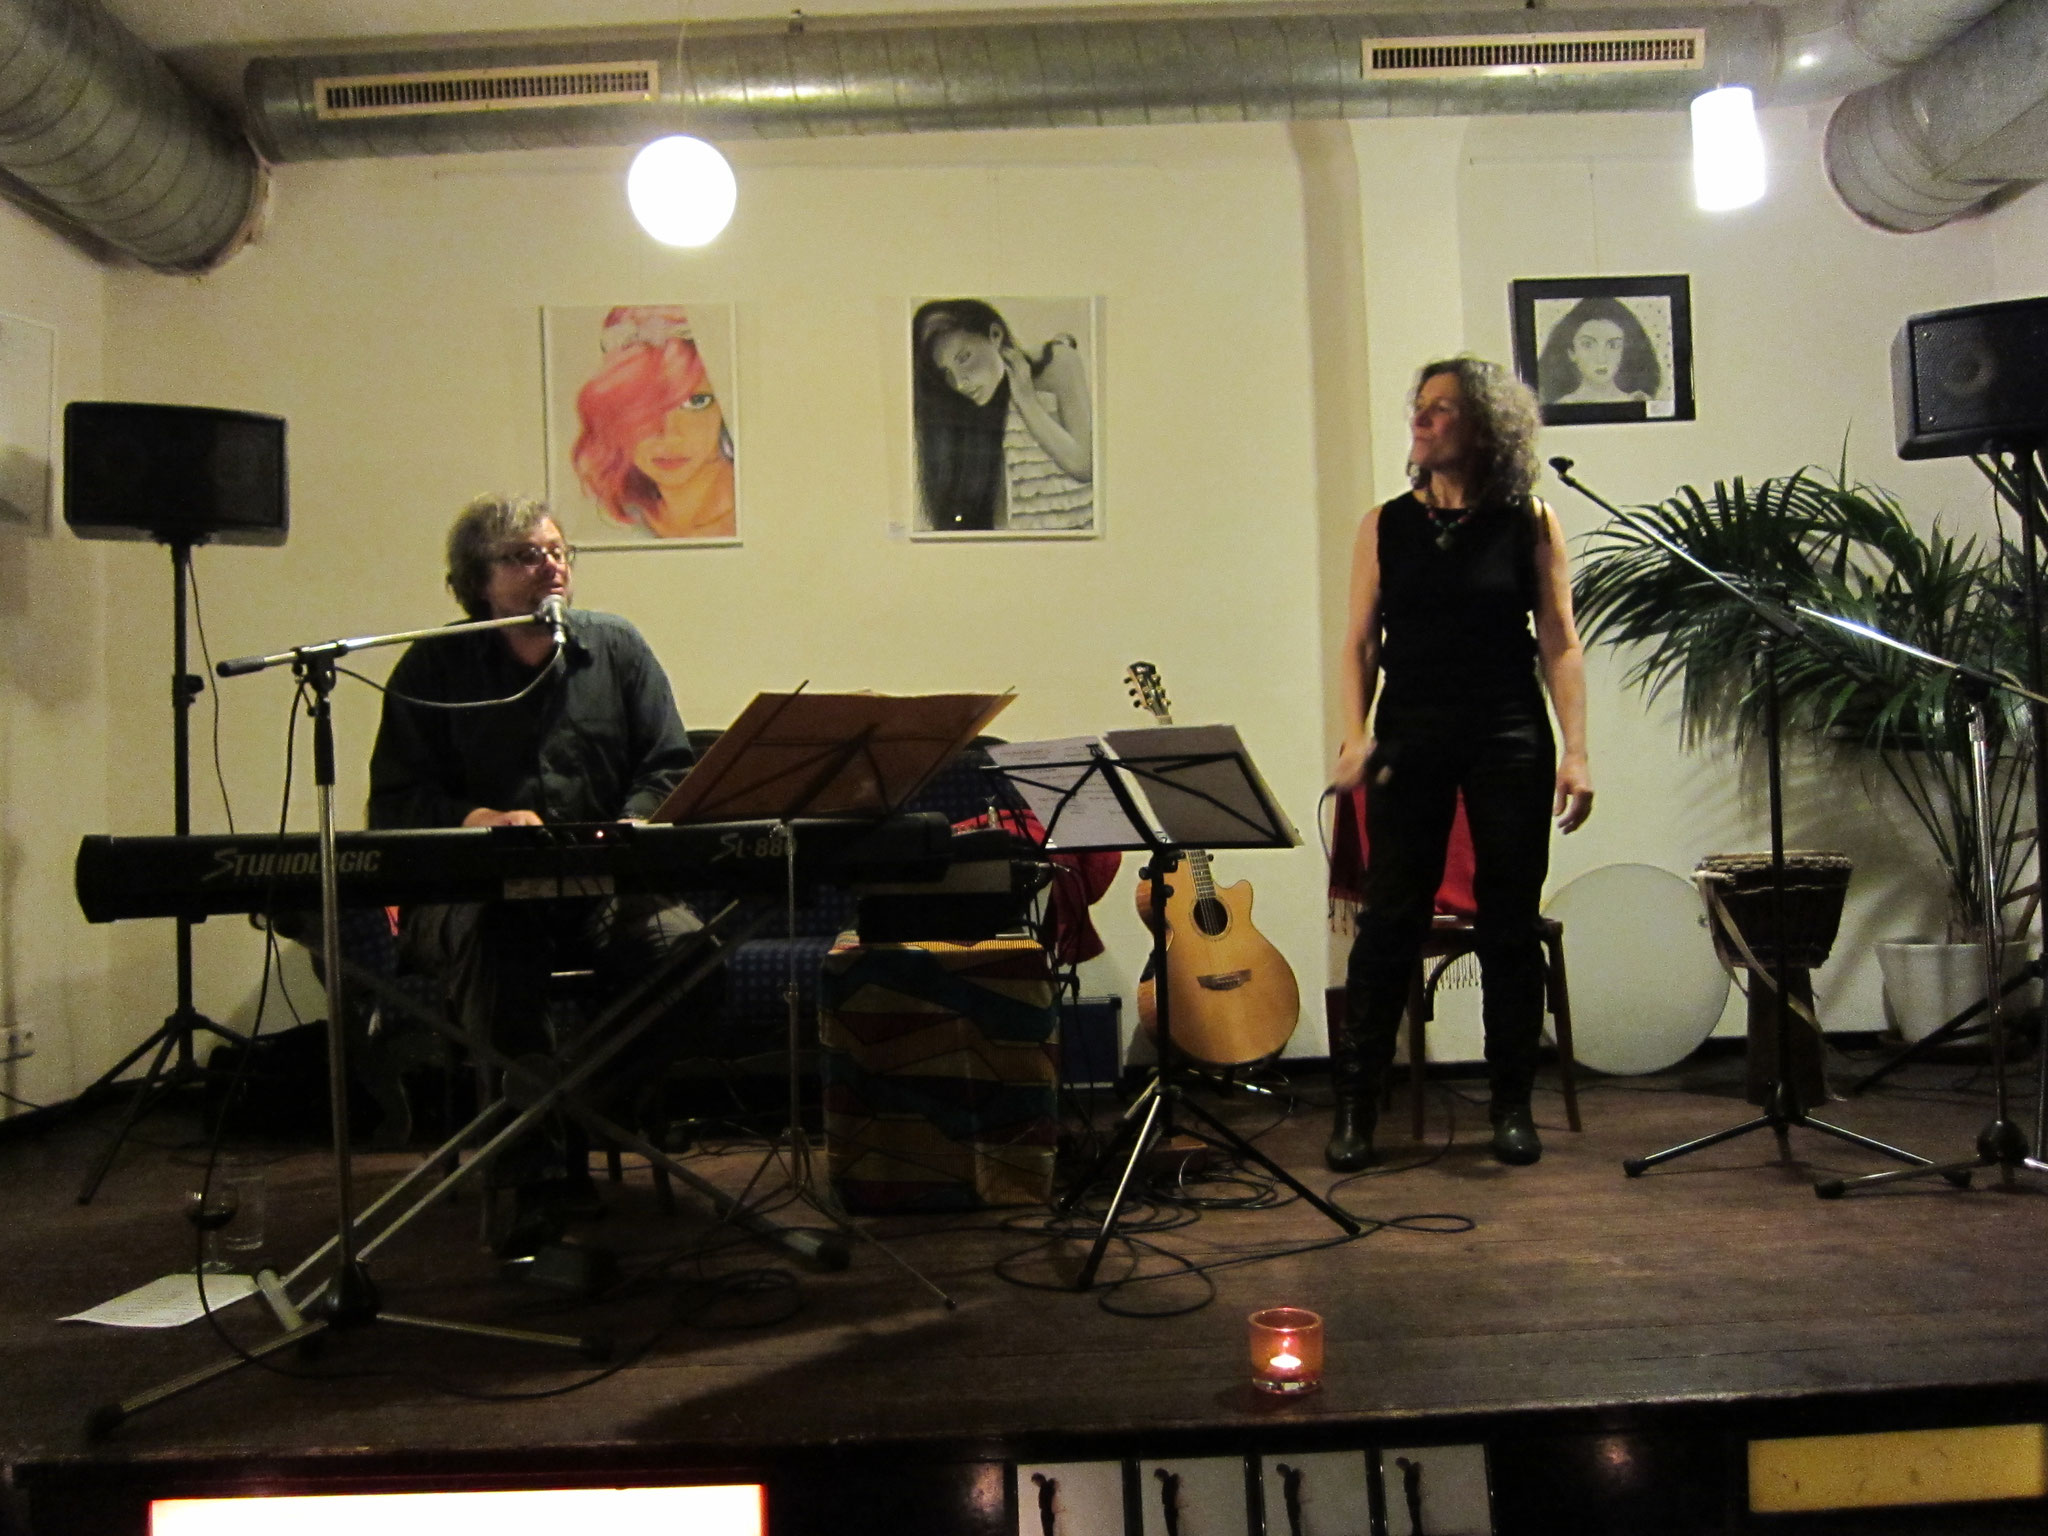 23.02.2013 Duo Herzton (mit Karel Kaiser) im Balazzo Brozzi, Nürnberg (Foto Katharina Hubner)